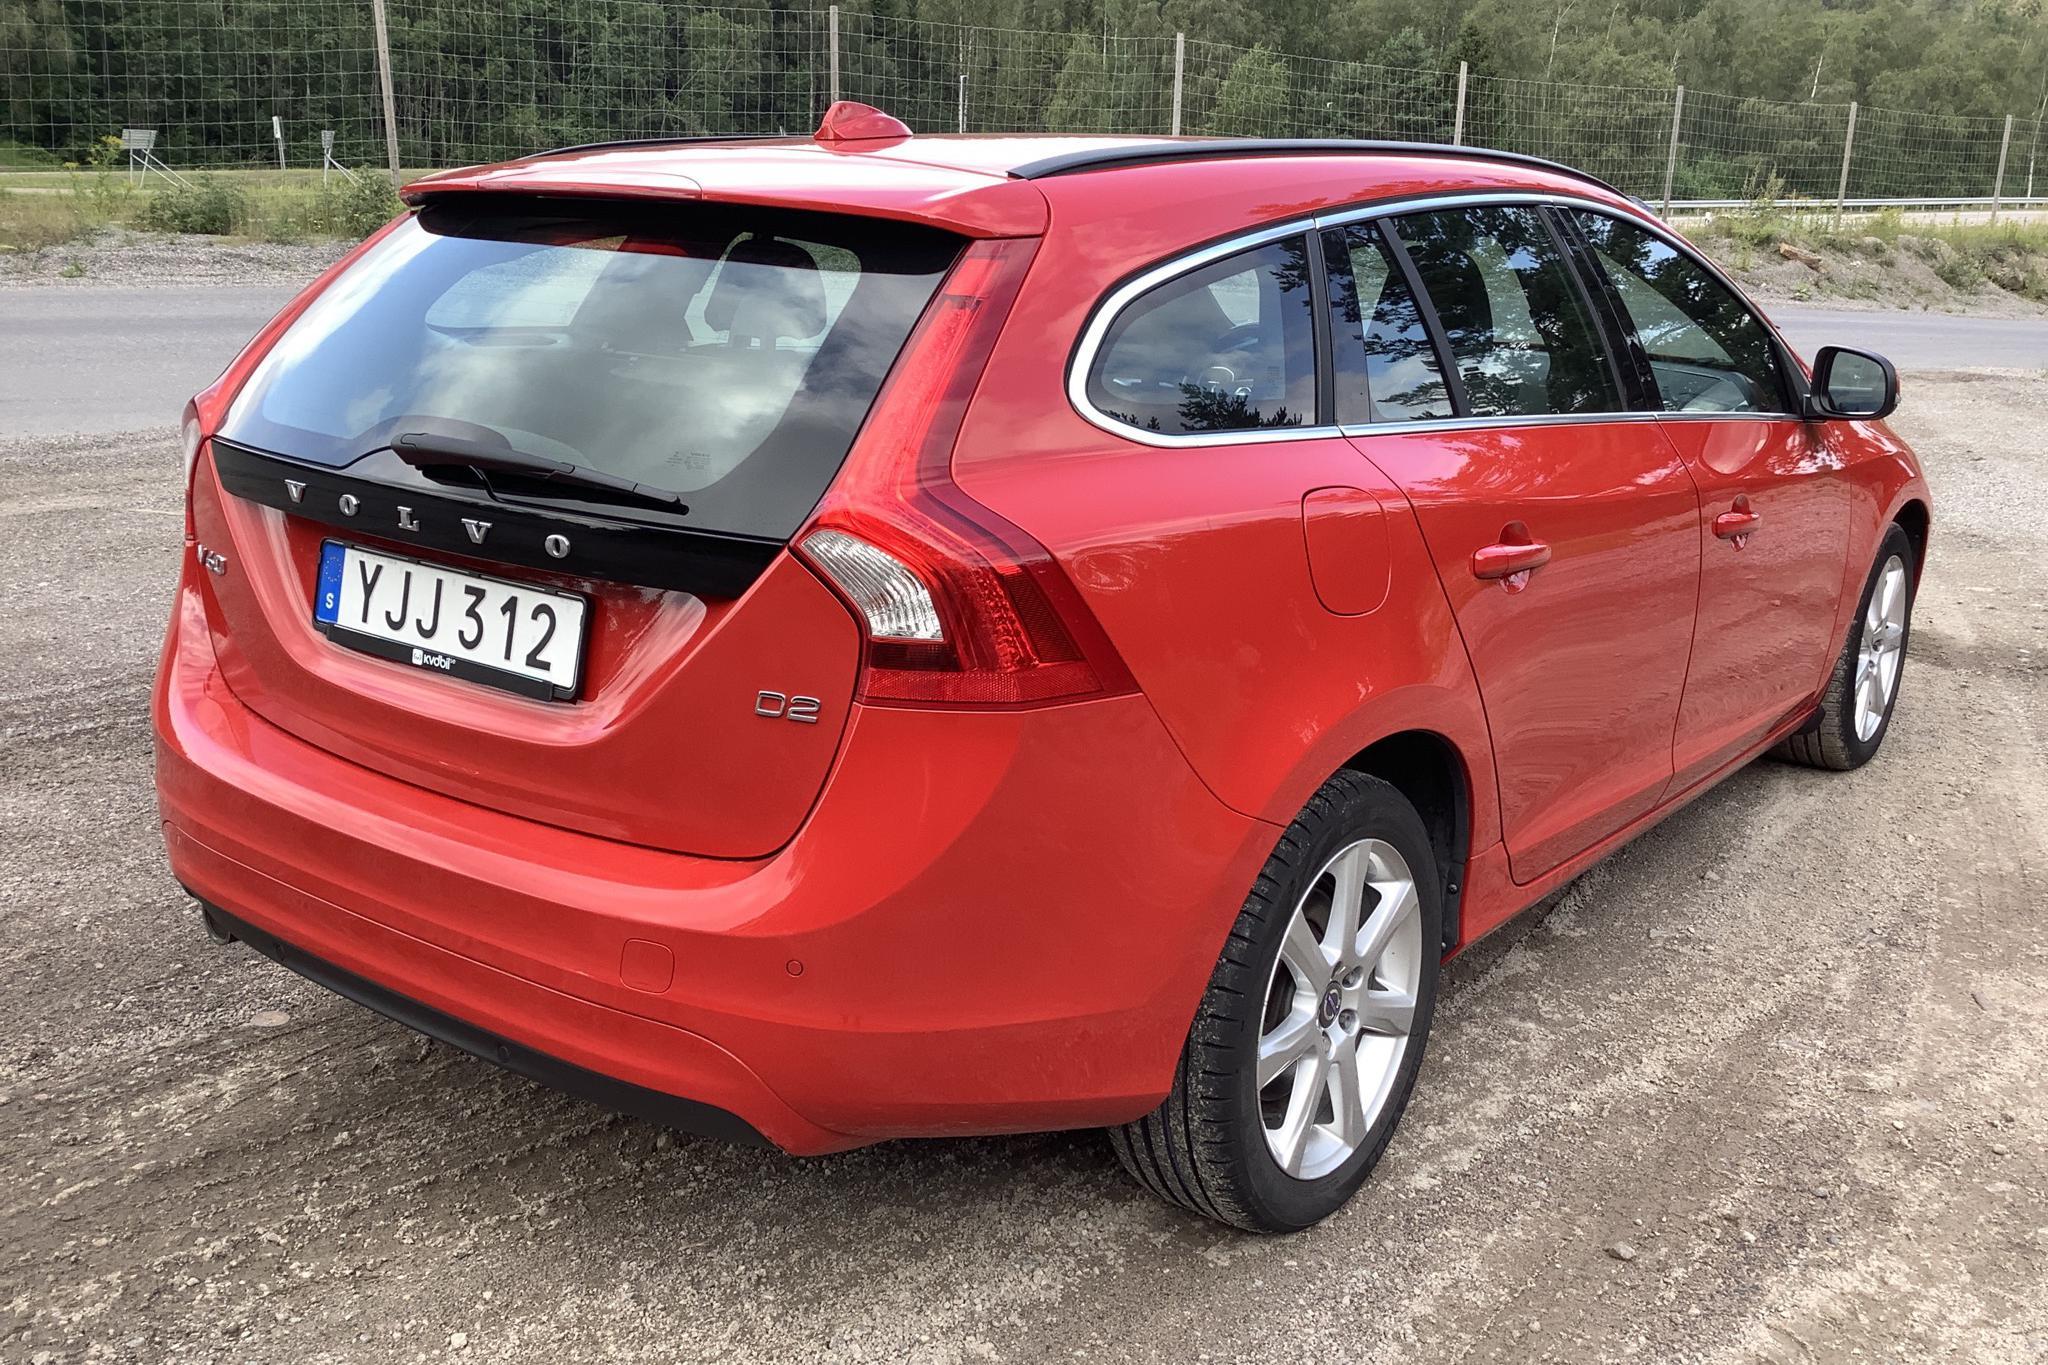 Volvo V60 D2 (120hk) - 9 029 mil - Manuell - röd - 2017